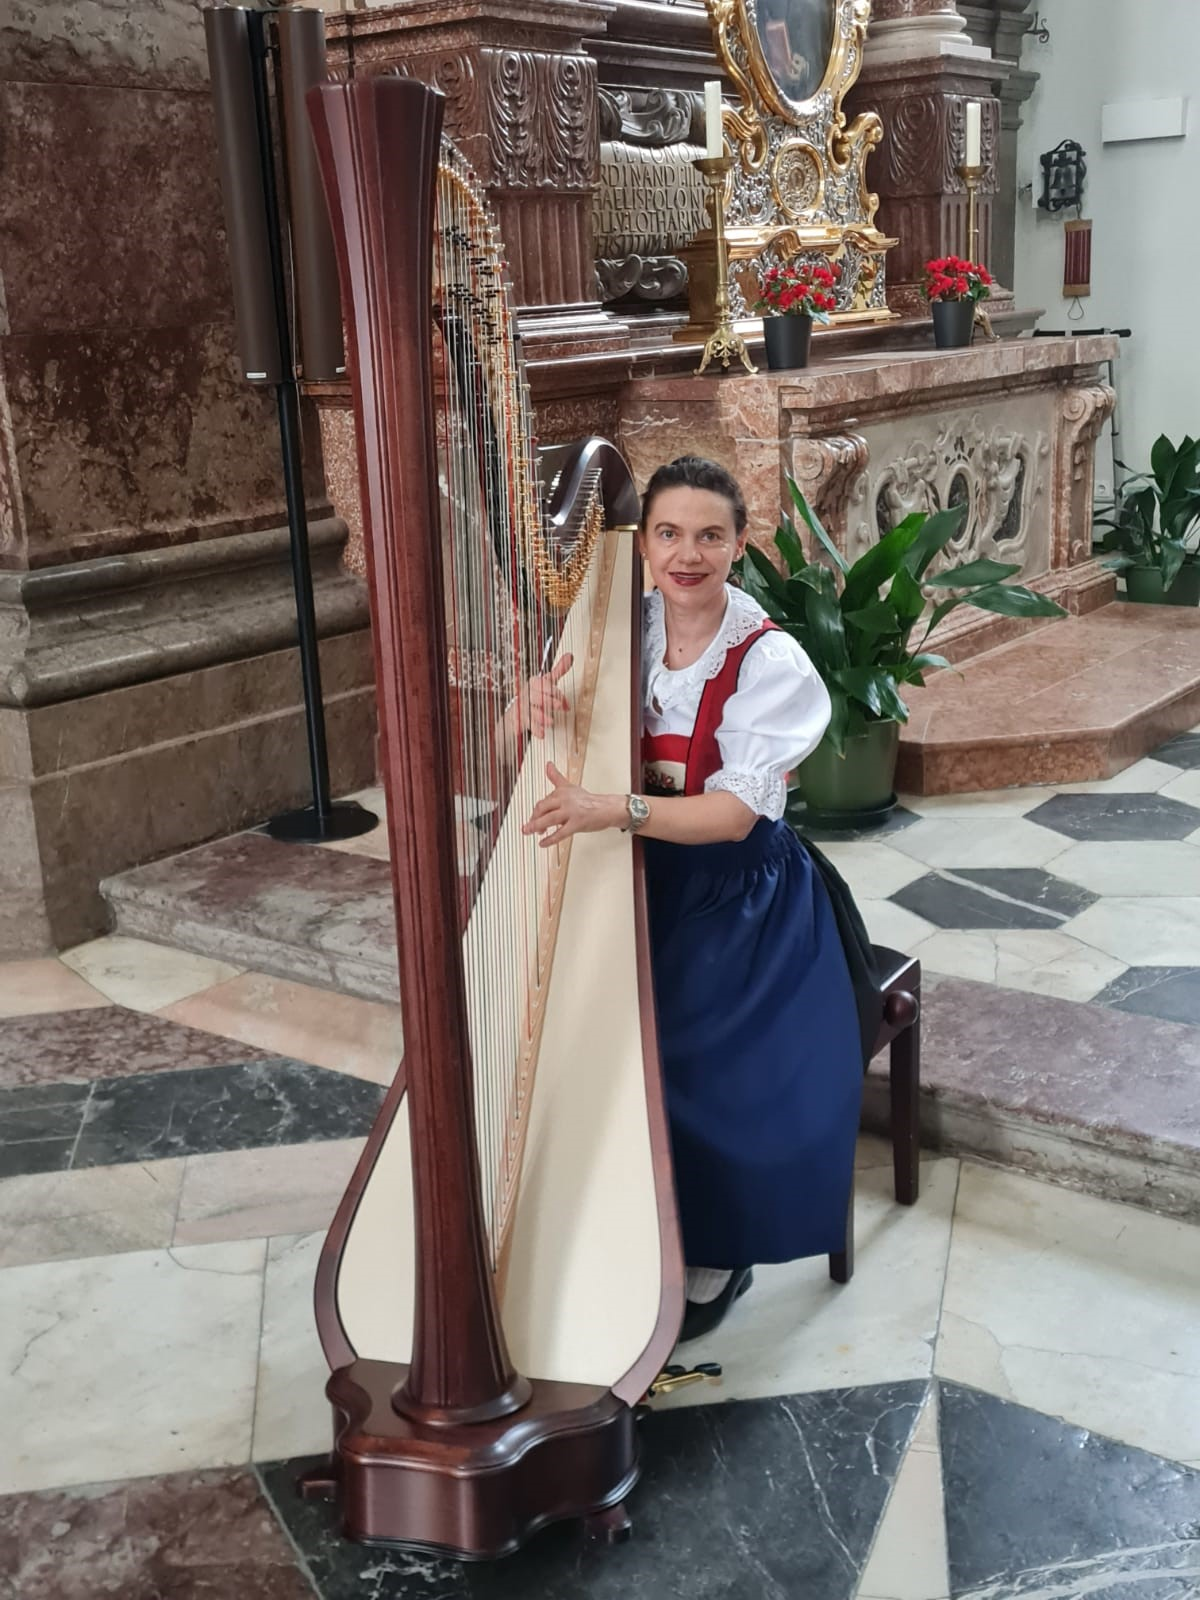 Harfenspielerin Margit